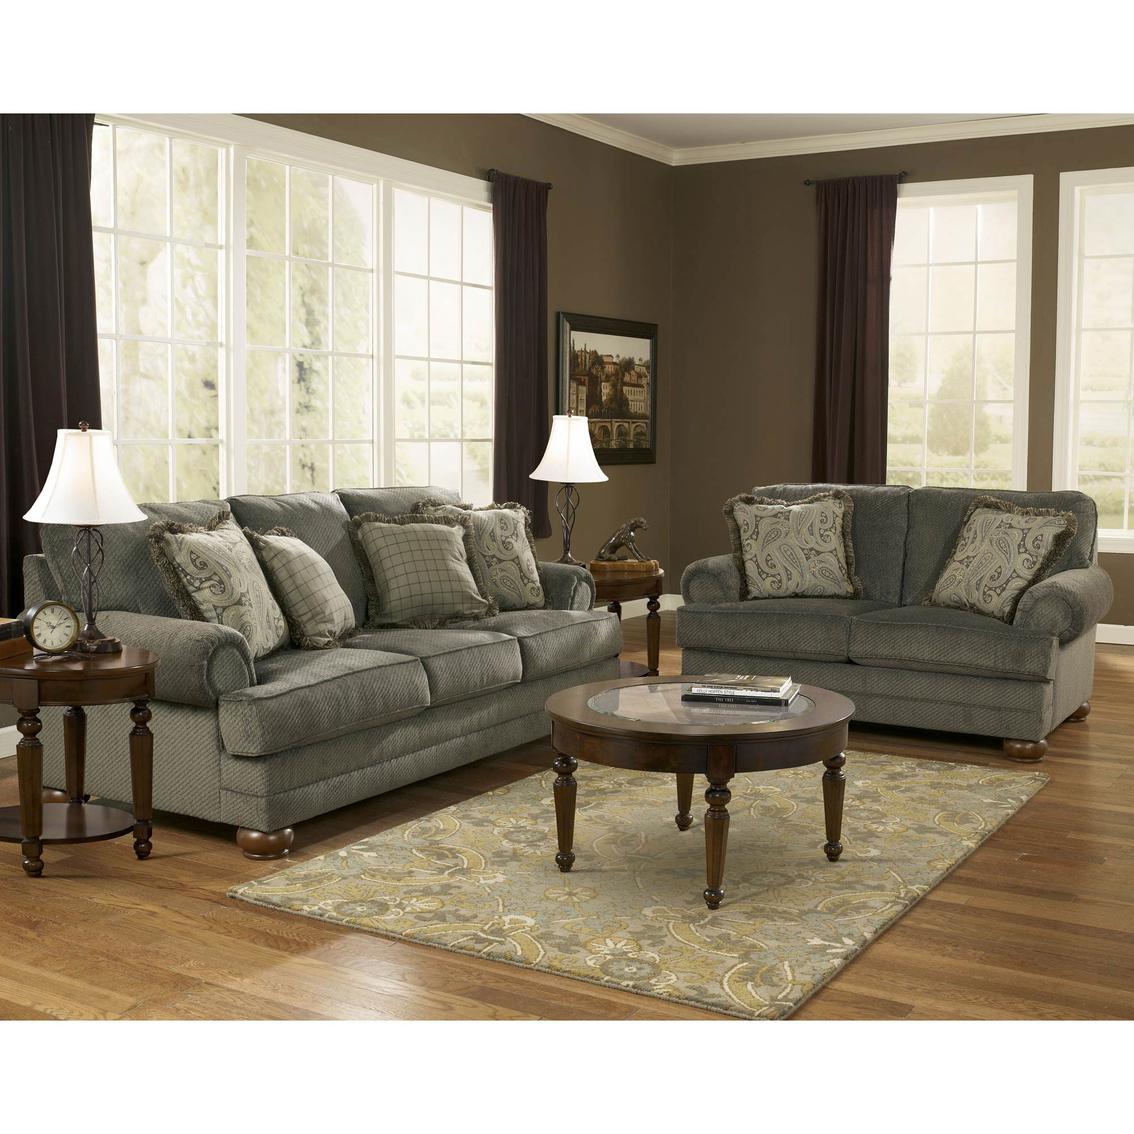 Ashley Parcal Estates 4 Pc Living Room Set Living Room Sets Home A